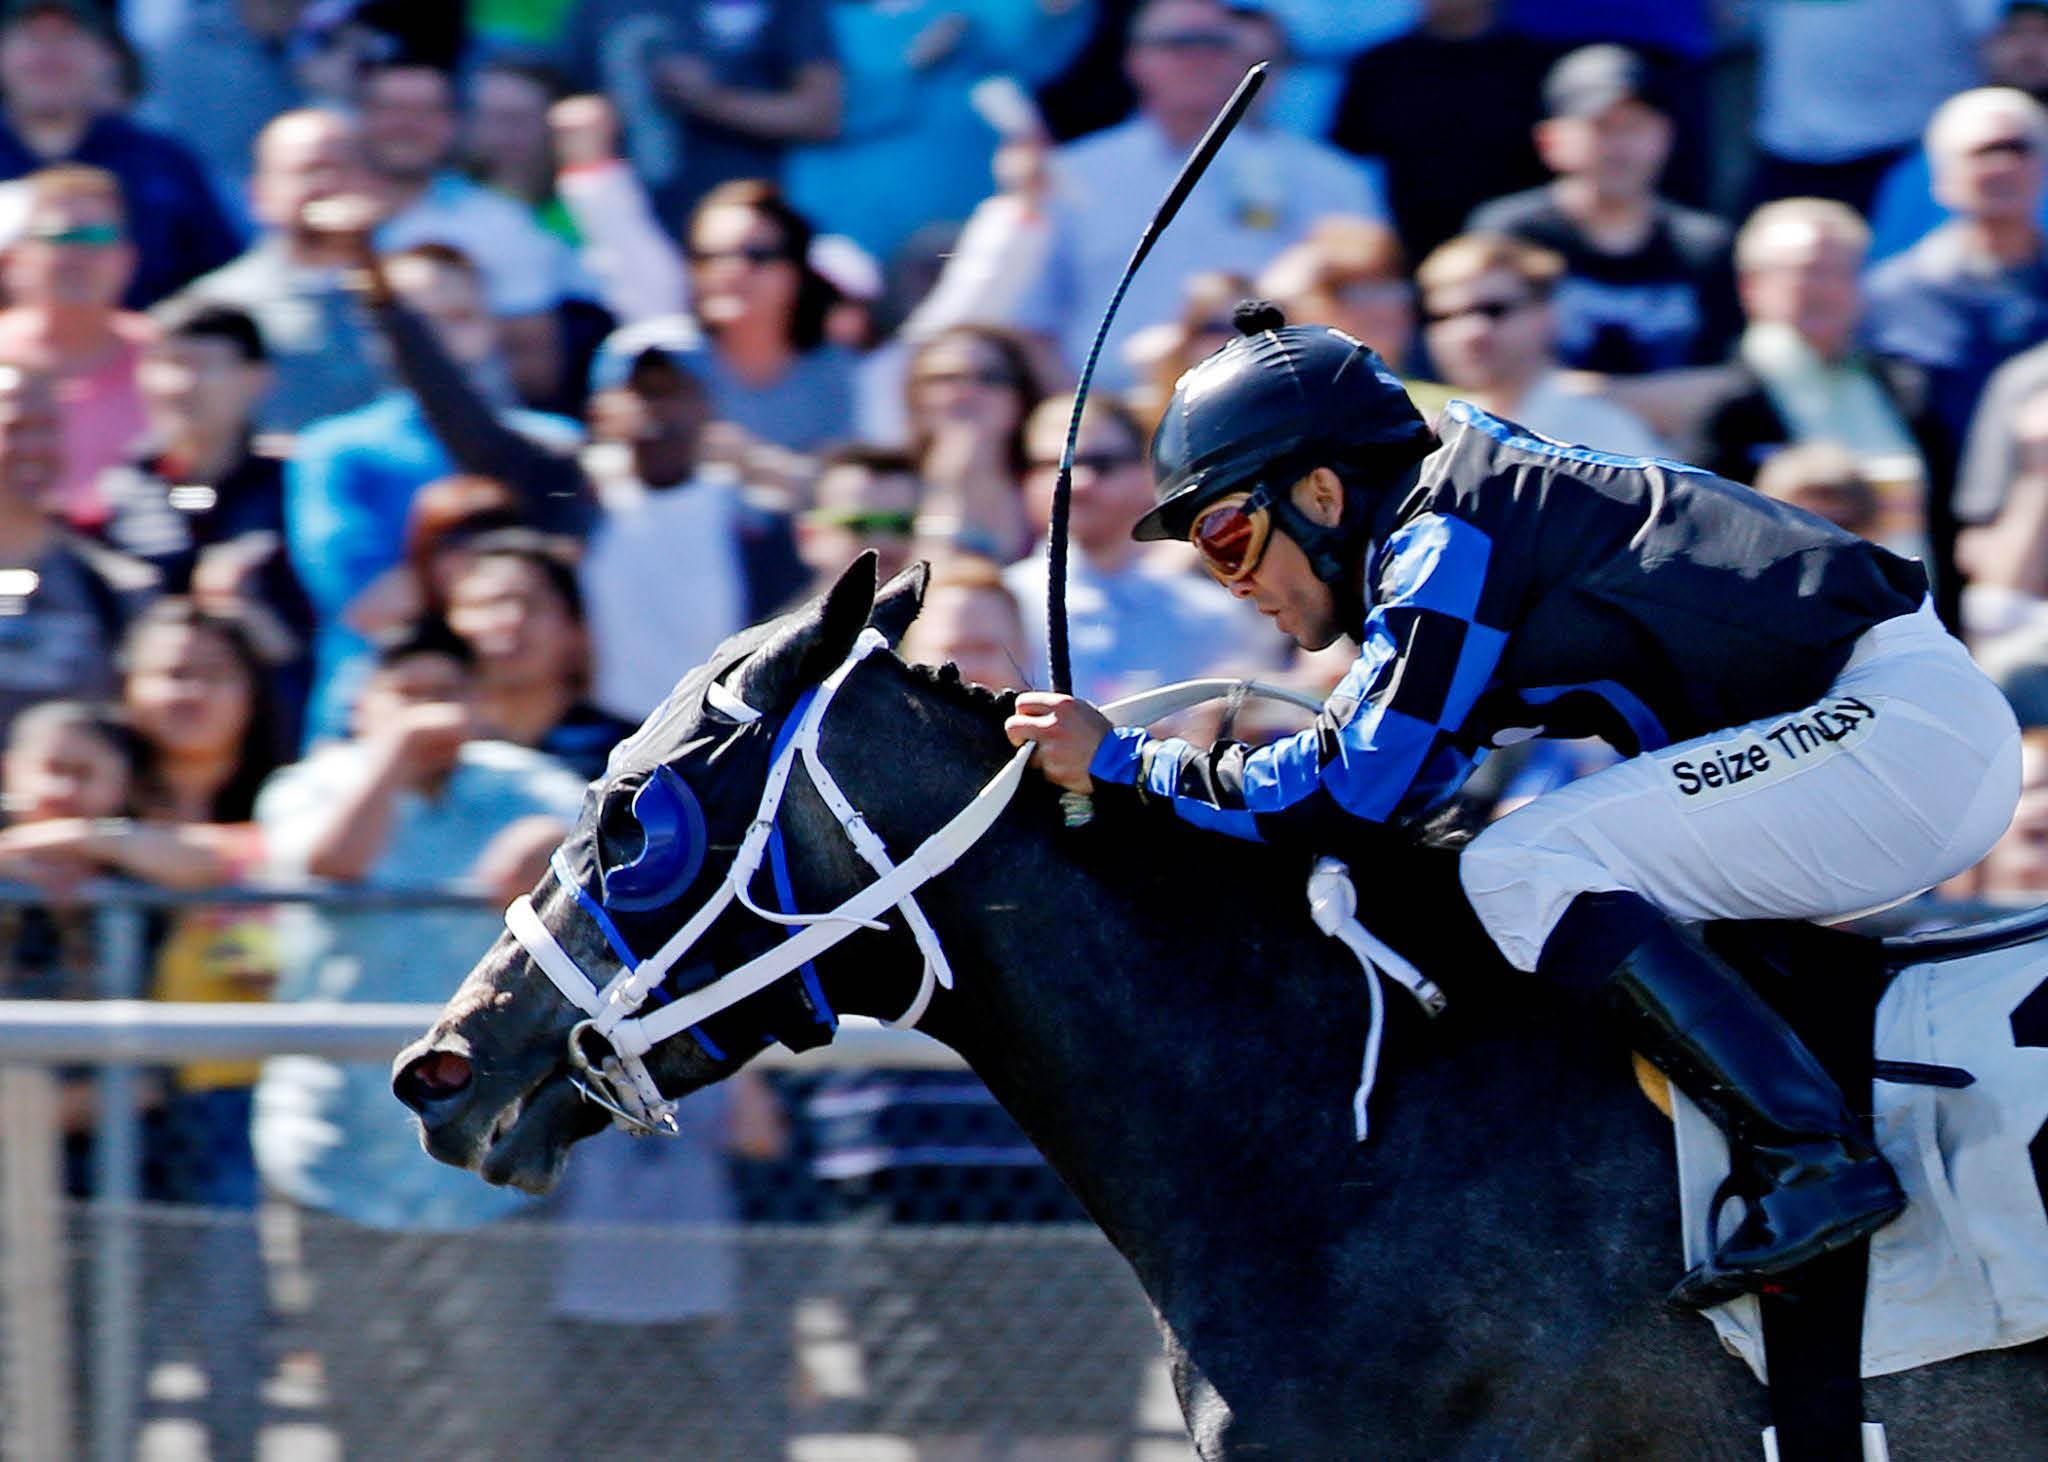 Emerald Downs - racetrack - horse racing - Auburn, WA